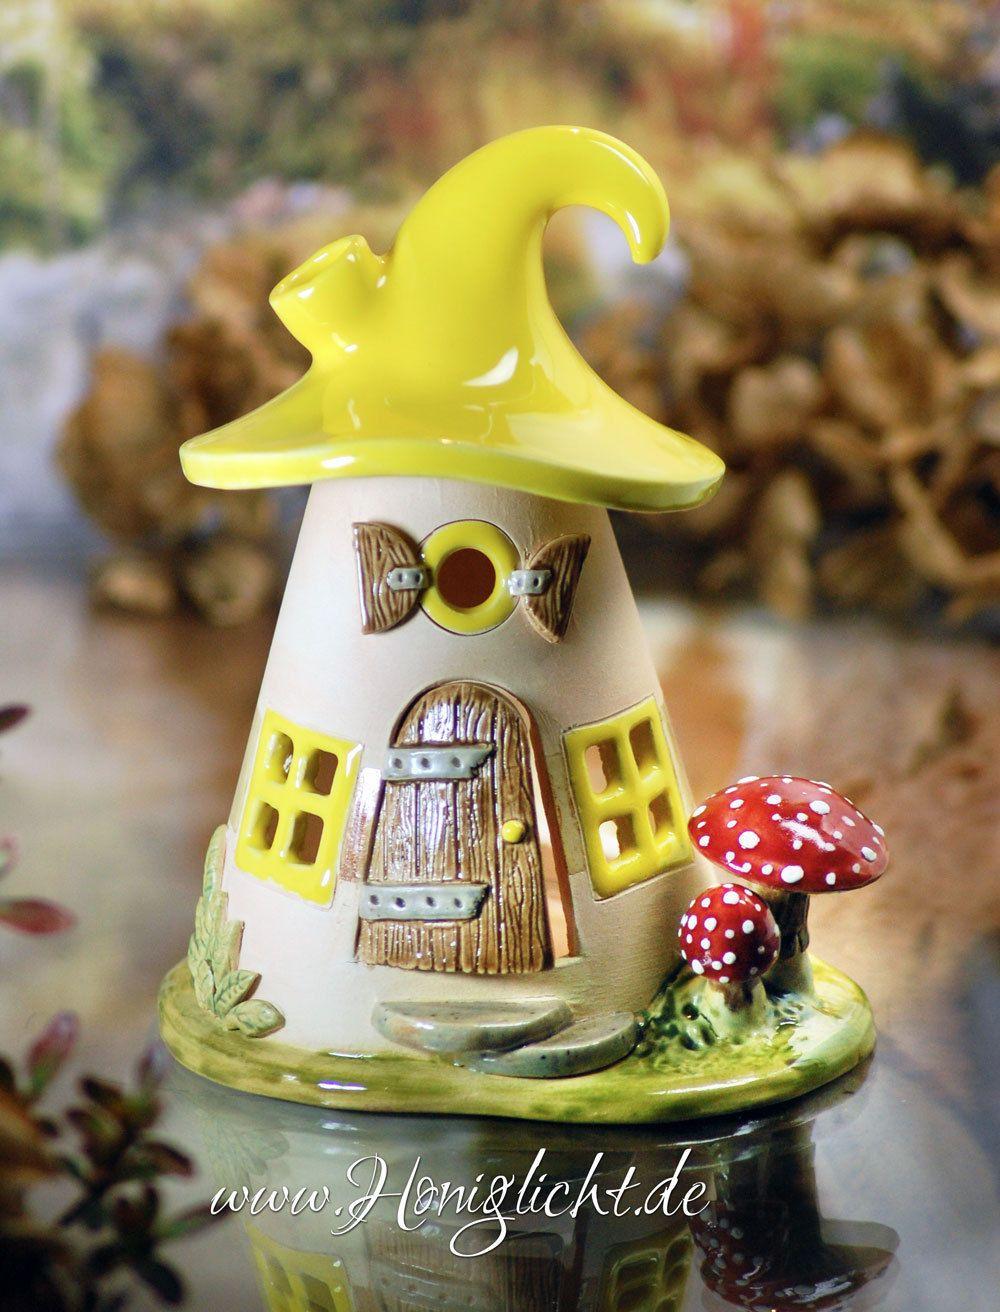 windlicht keramik elfenhaus gelb mit fliegenpilzen 2tlg in antiquit ten kunst porzellan. Black Bedroom Furniture Sets. Home Design Ideas